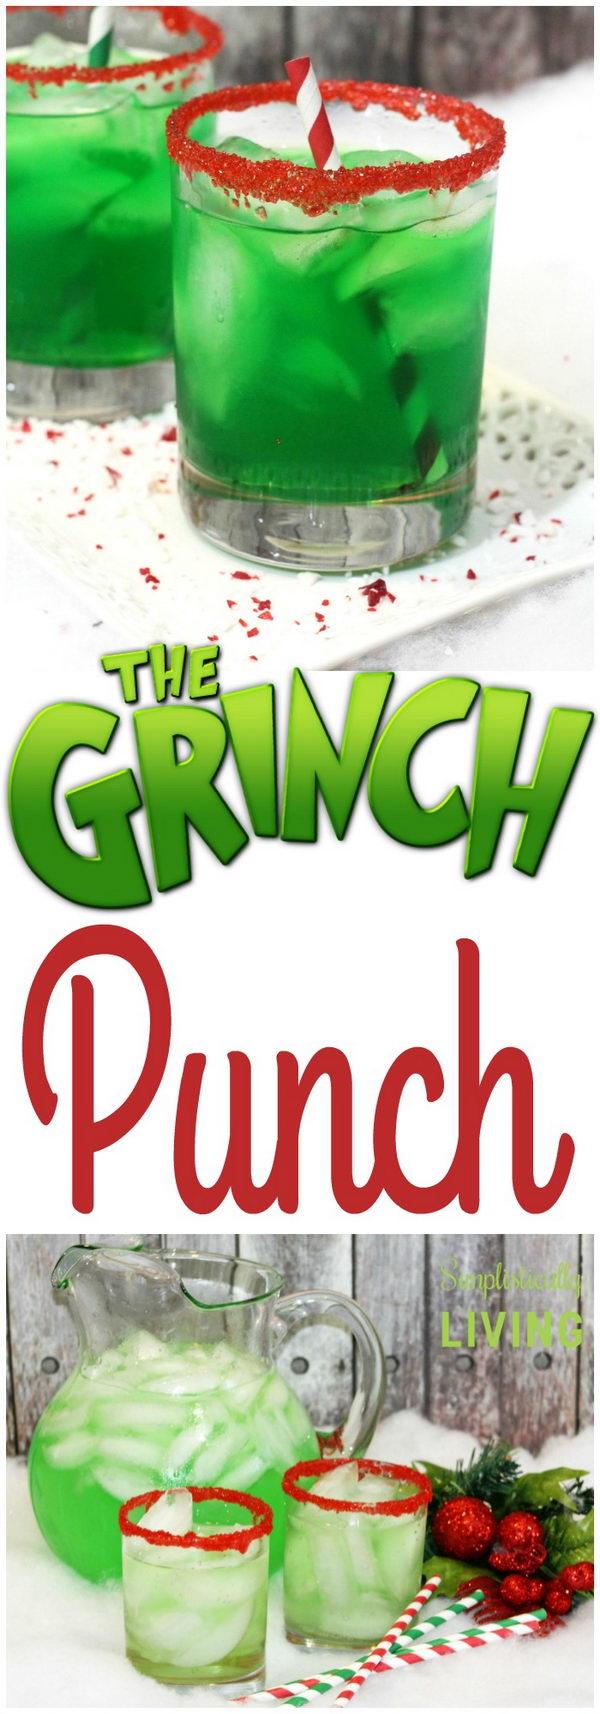 Grinch Punch.